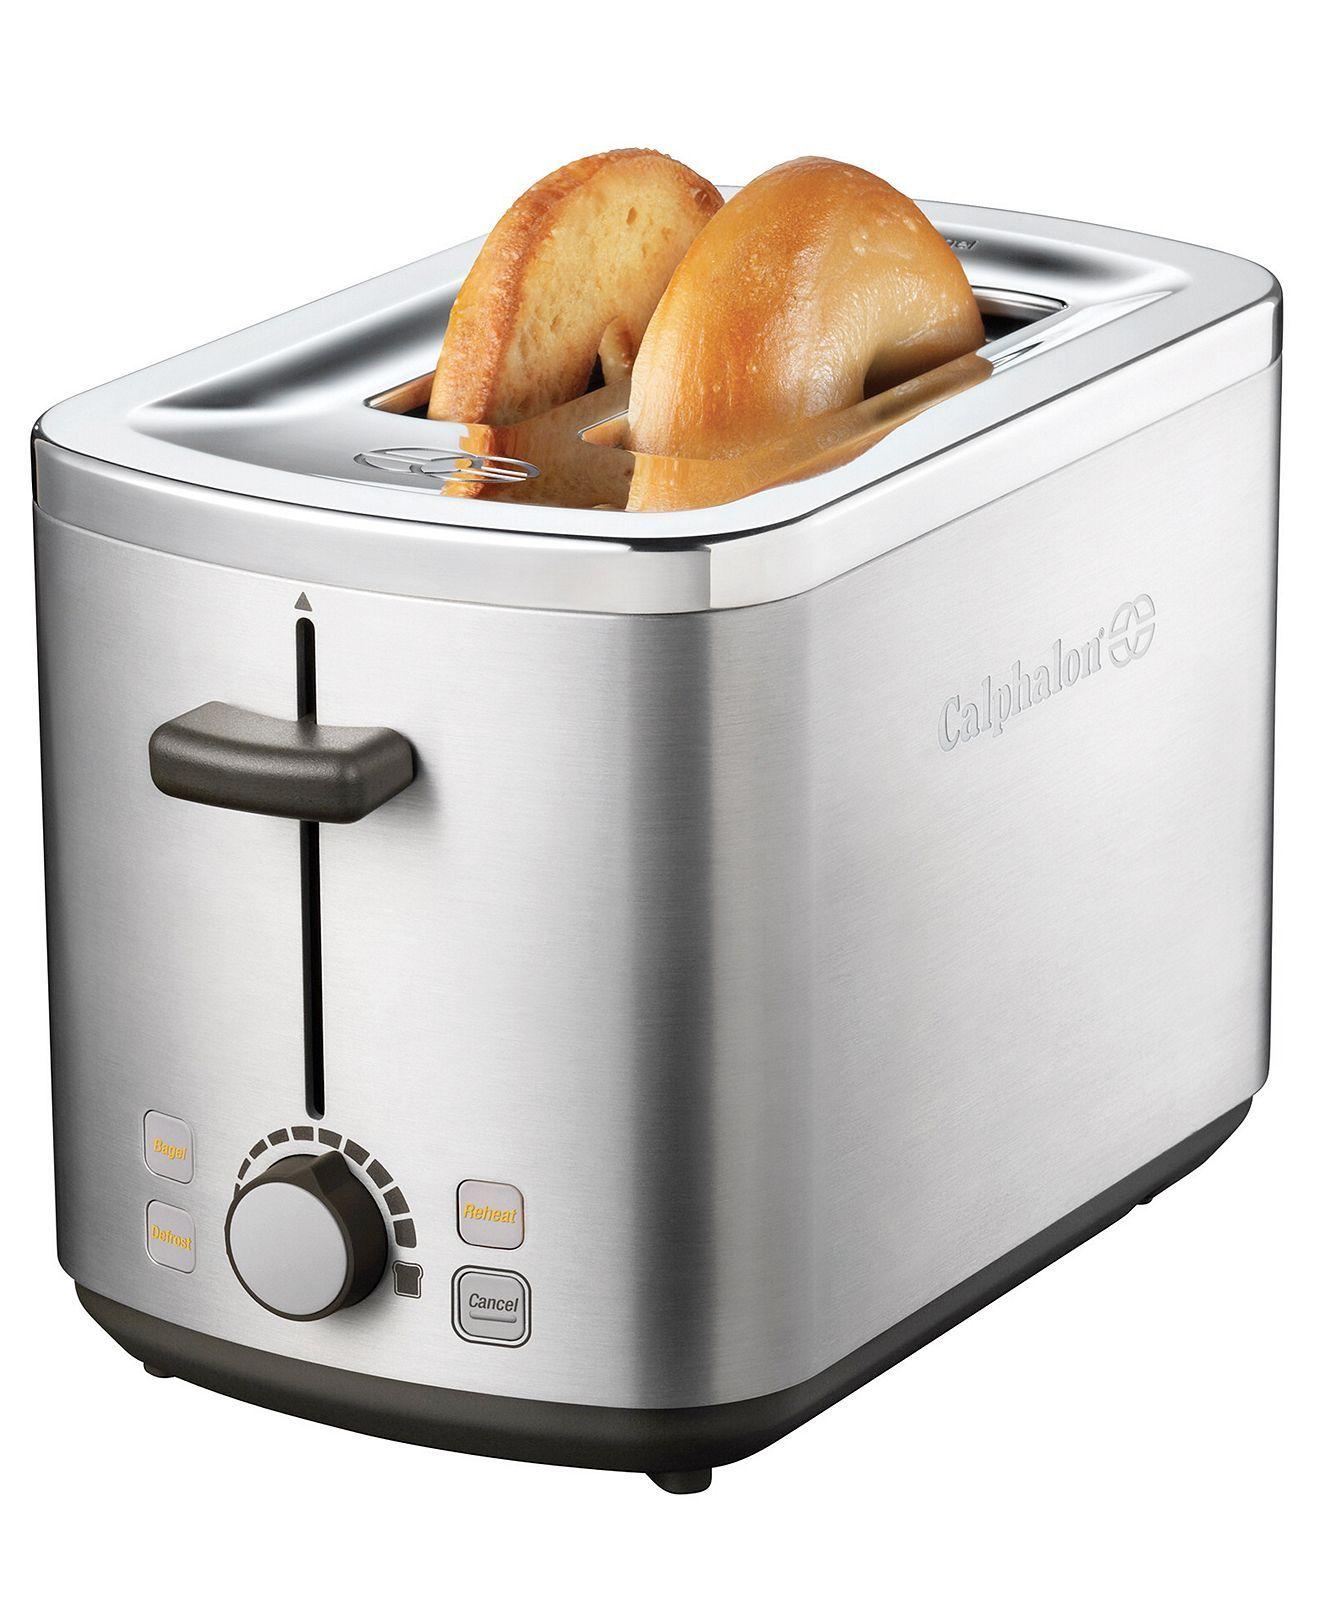 calphalon 2 slice toaster electrics kitchen macy s